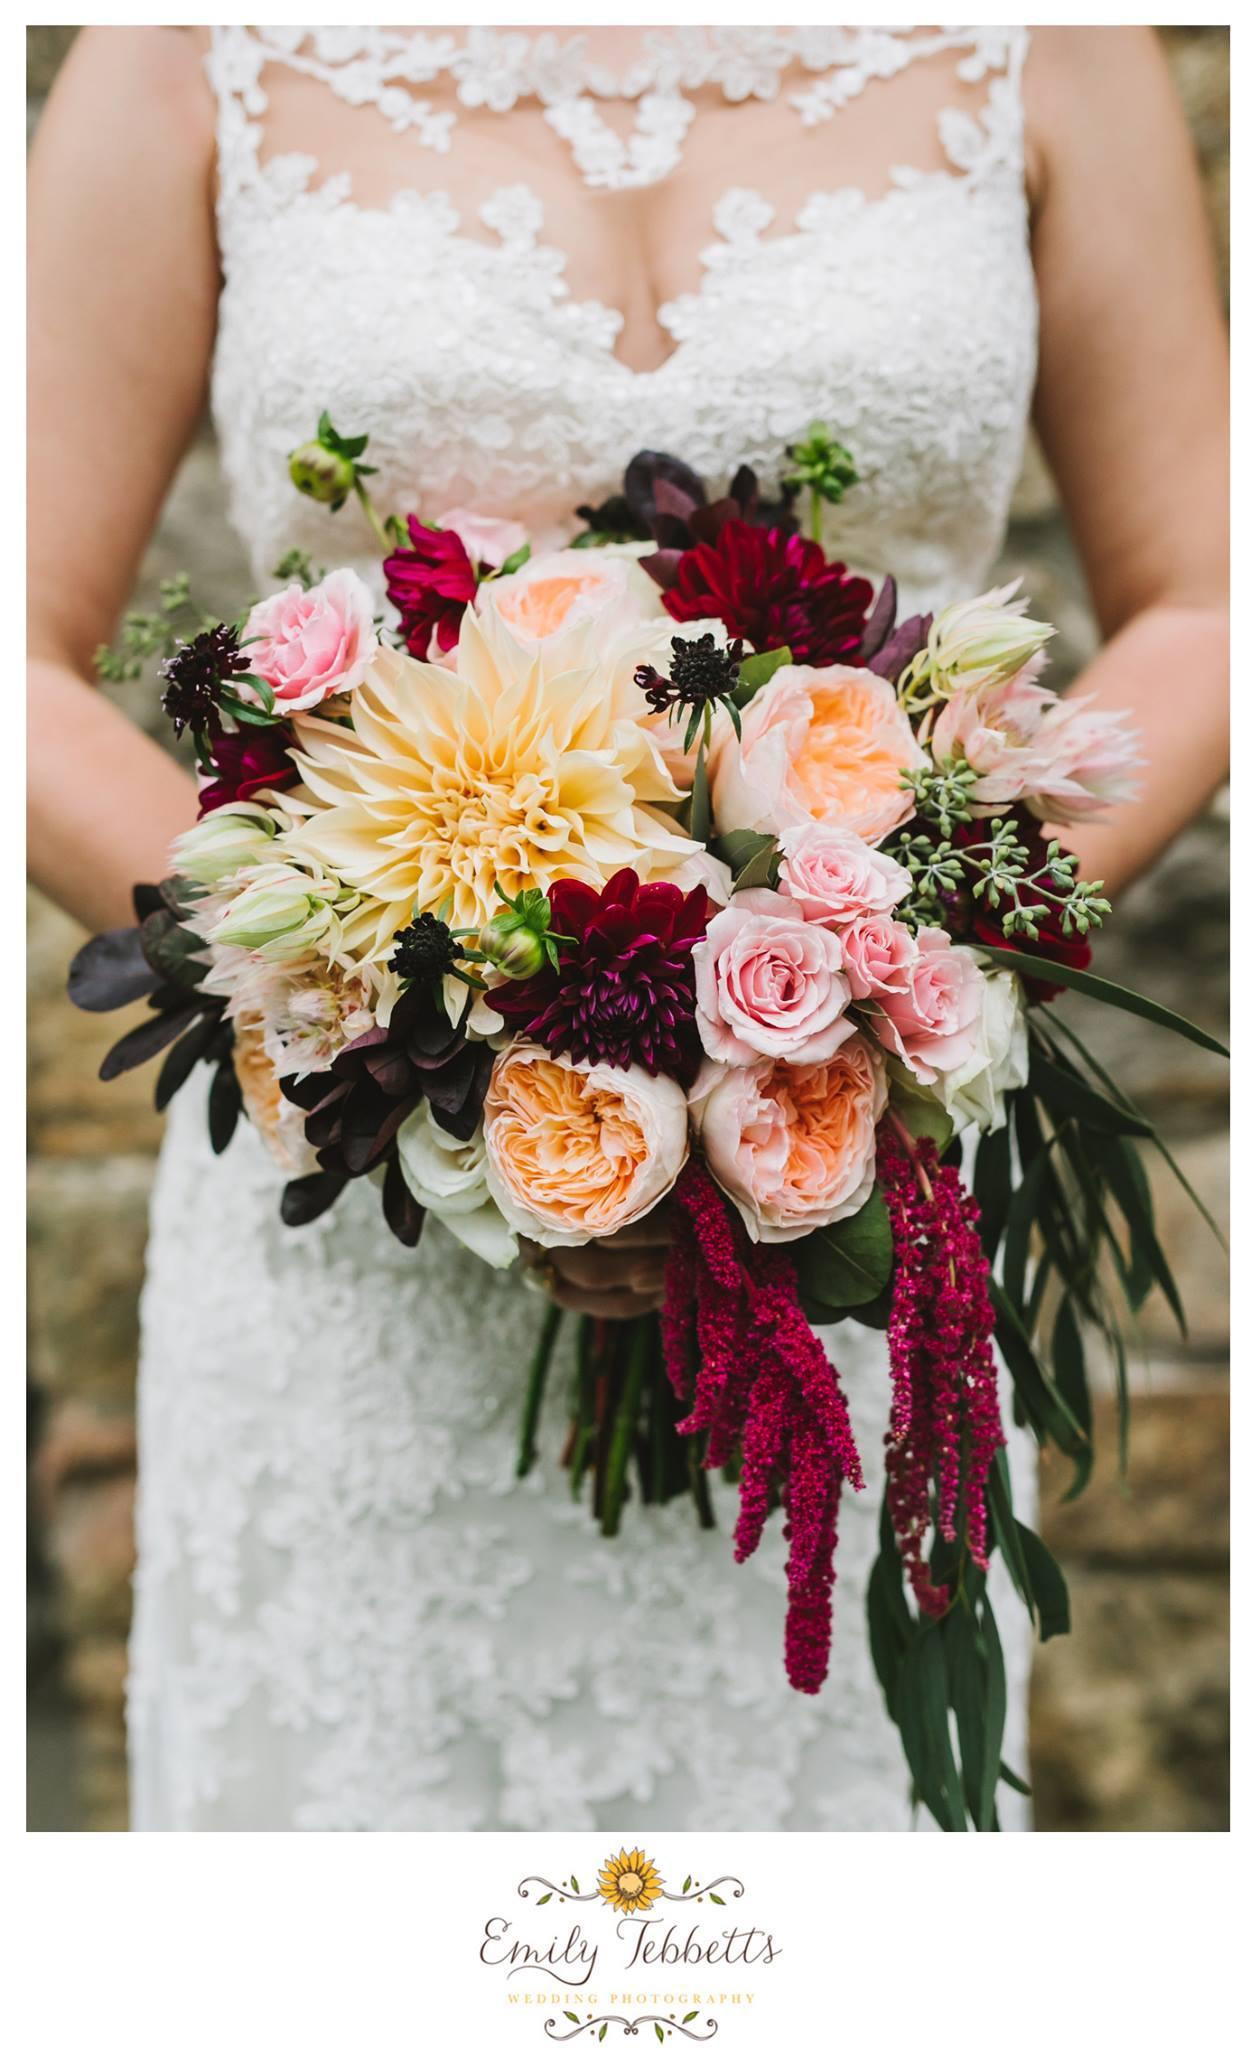 Basking Ridge, NJ - Emily Tebbetts Wedding Photography 1.jpg